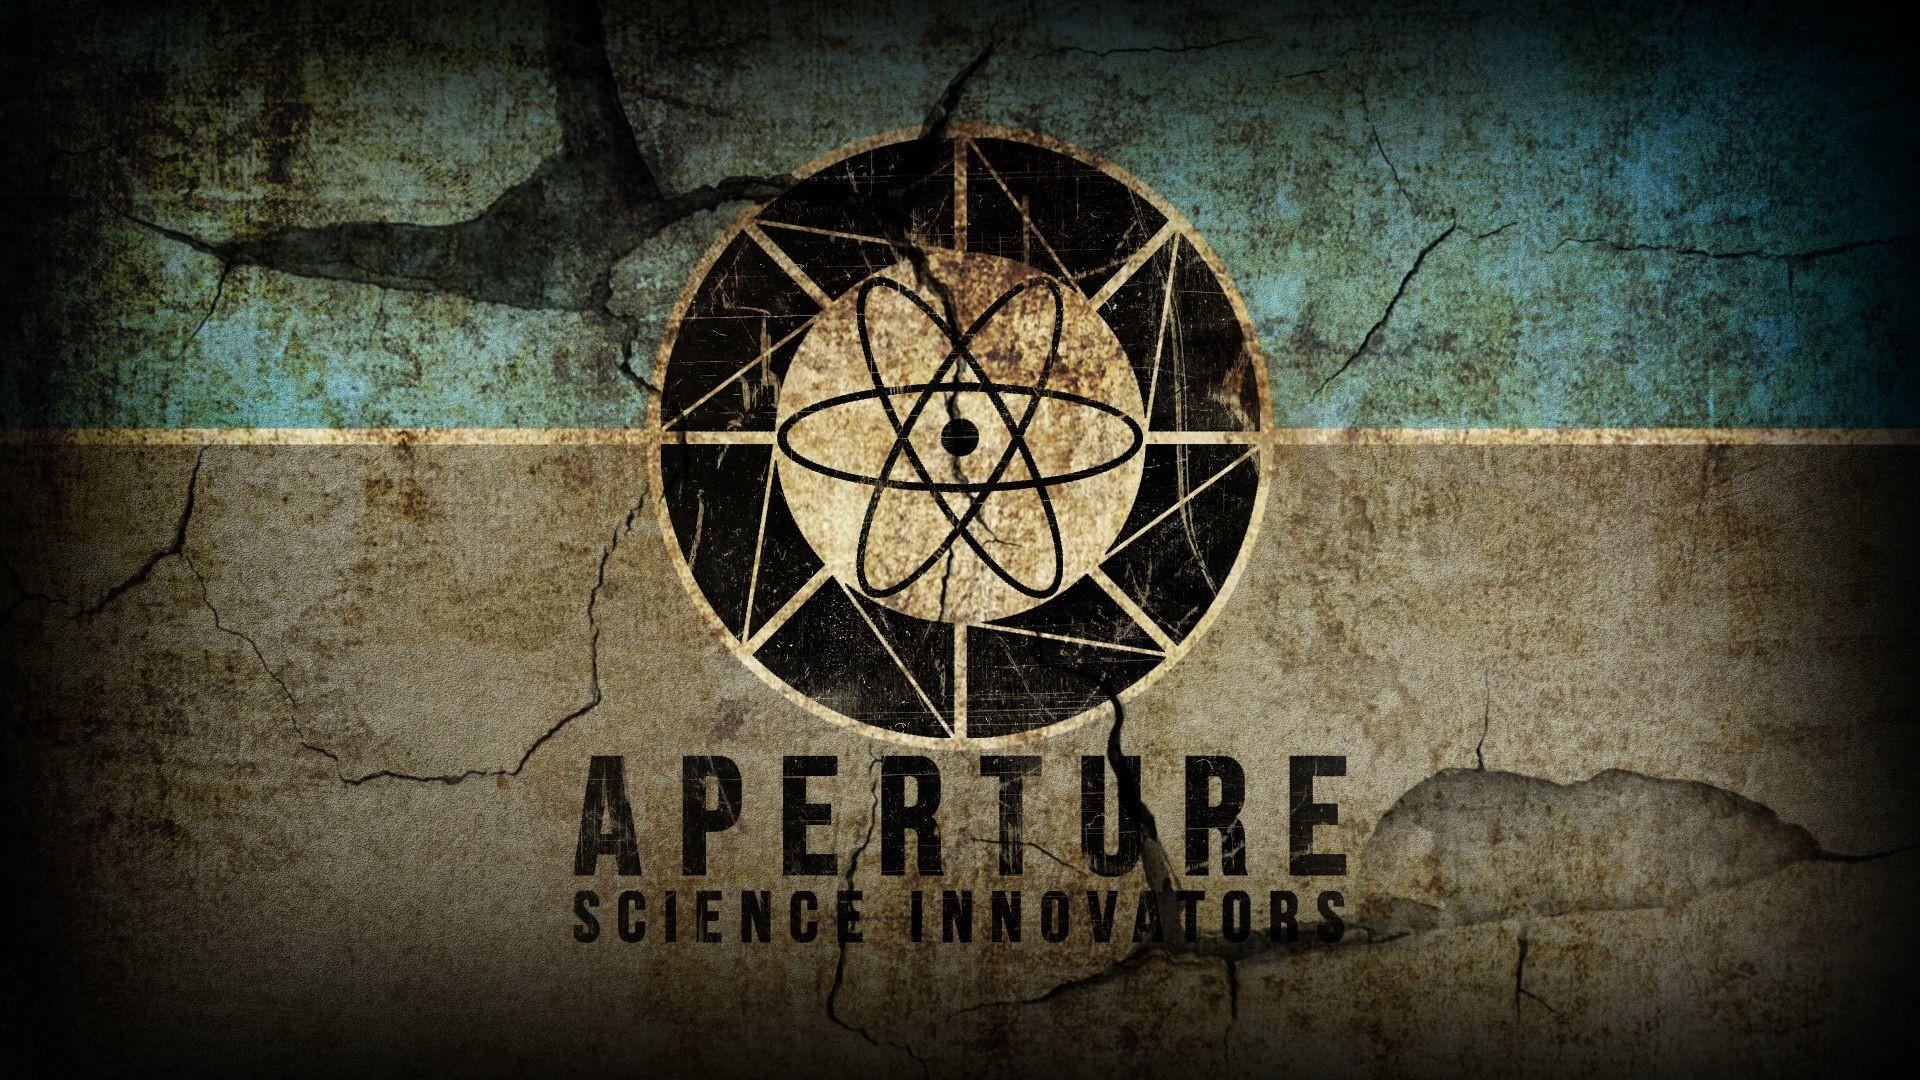 Aperture Science HD Wallpaper